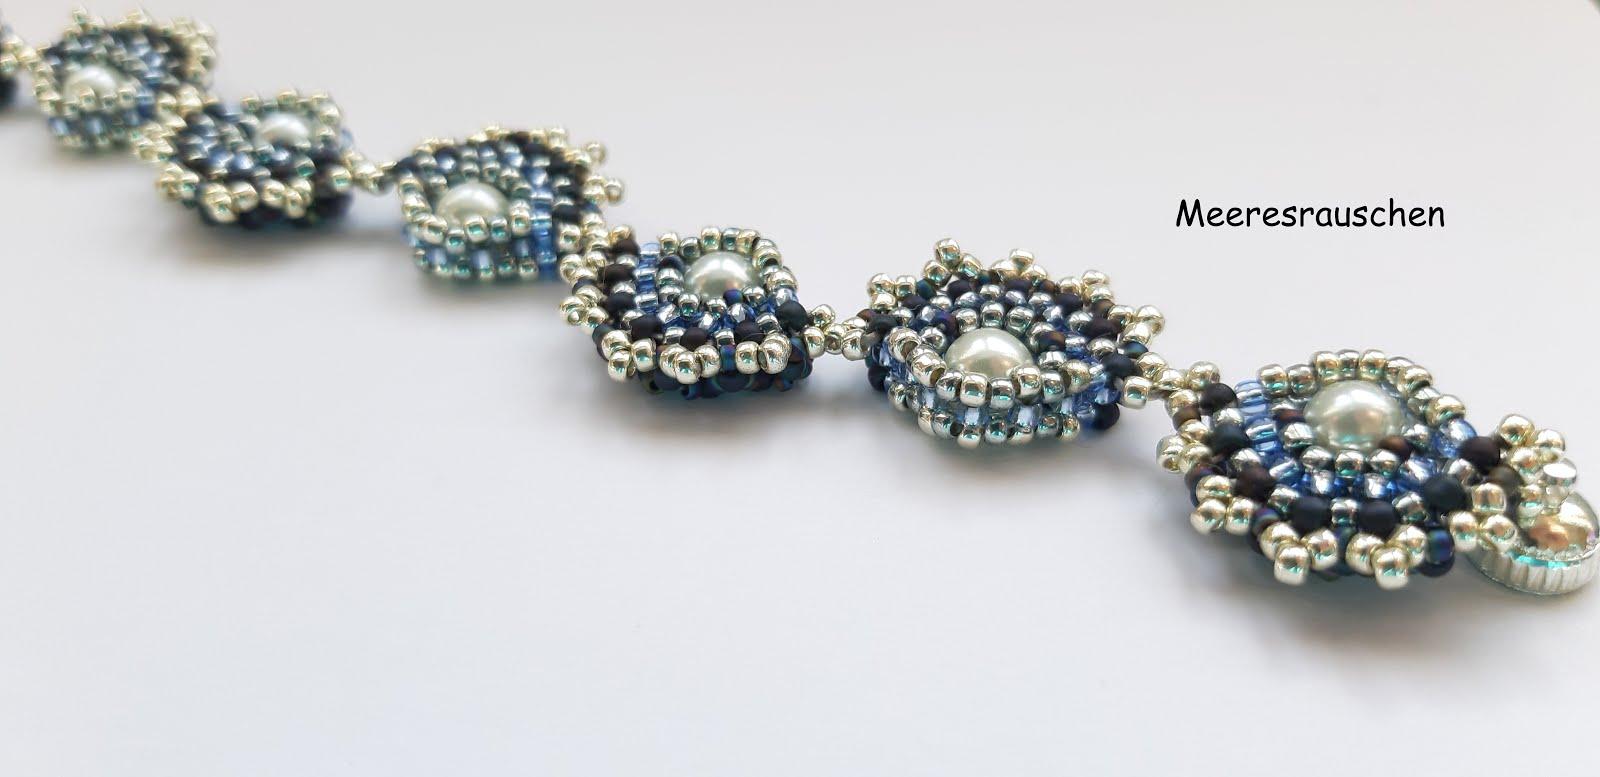 Meeresrauschen - Armband/Ohrringe/Kette